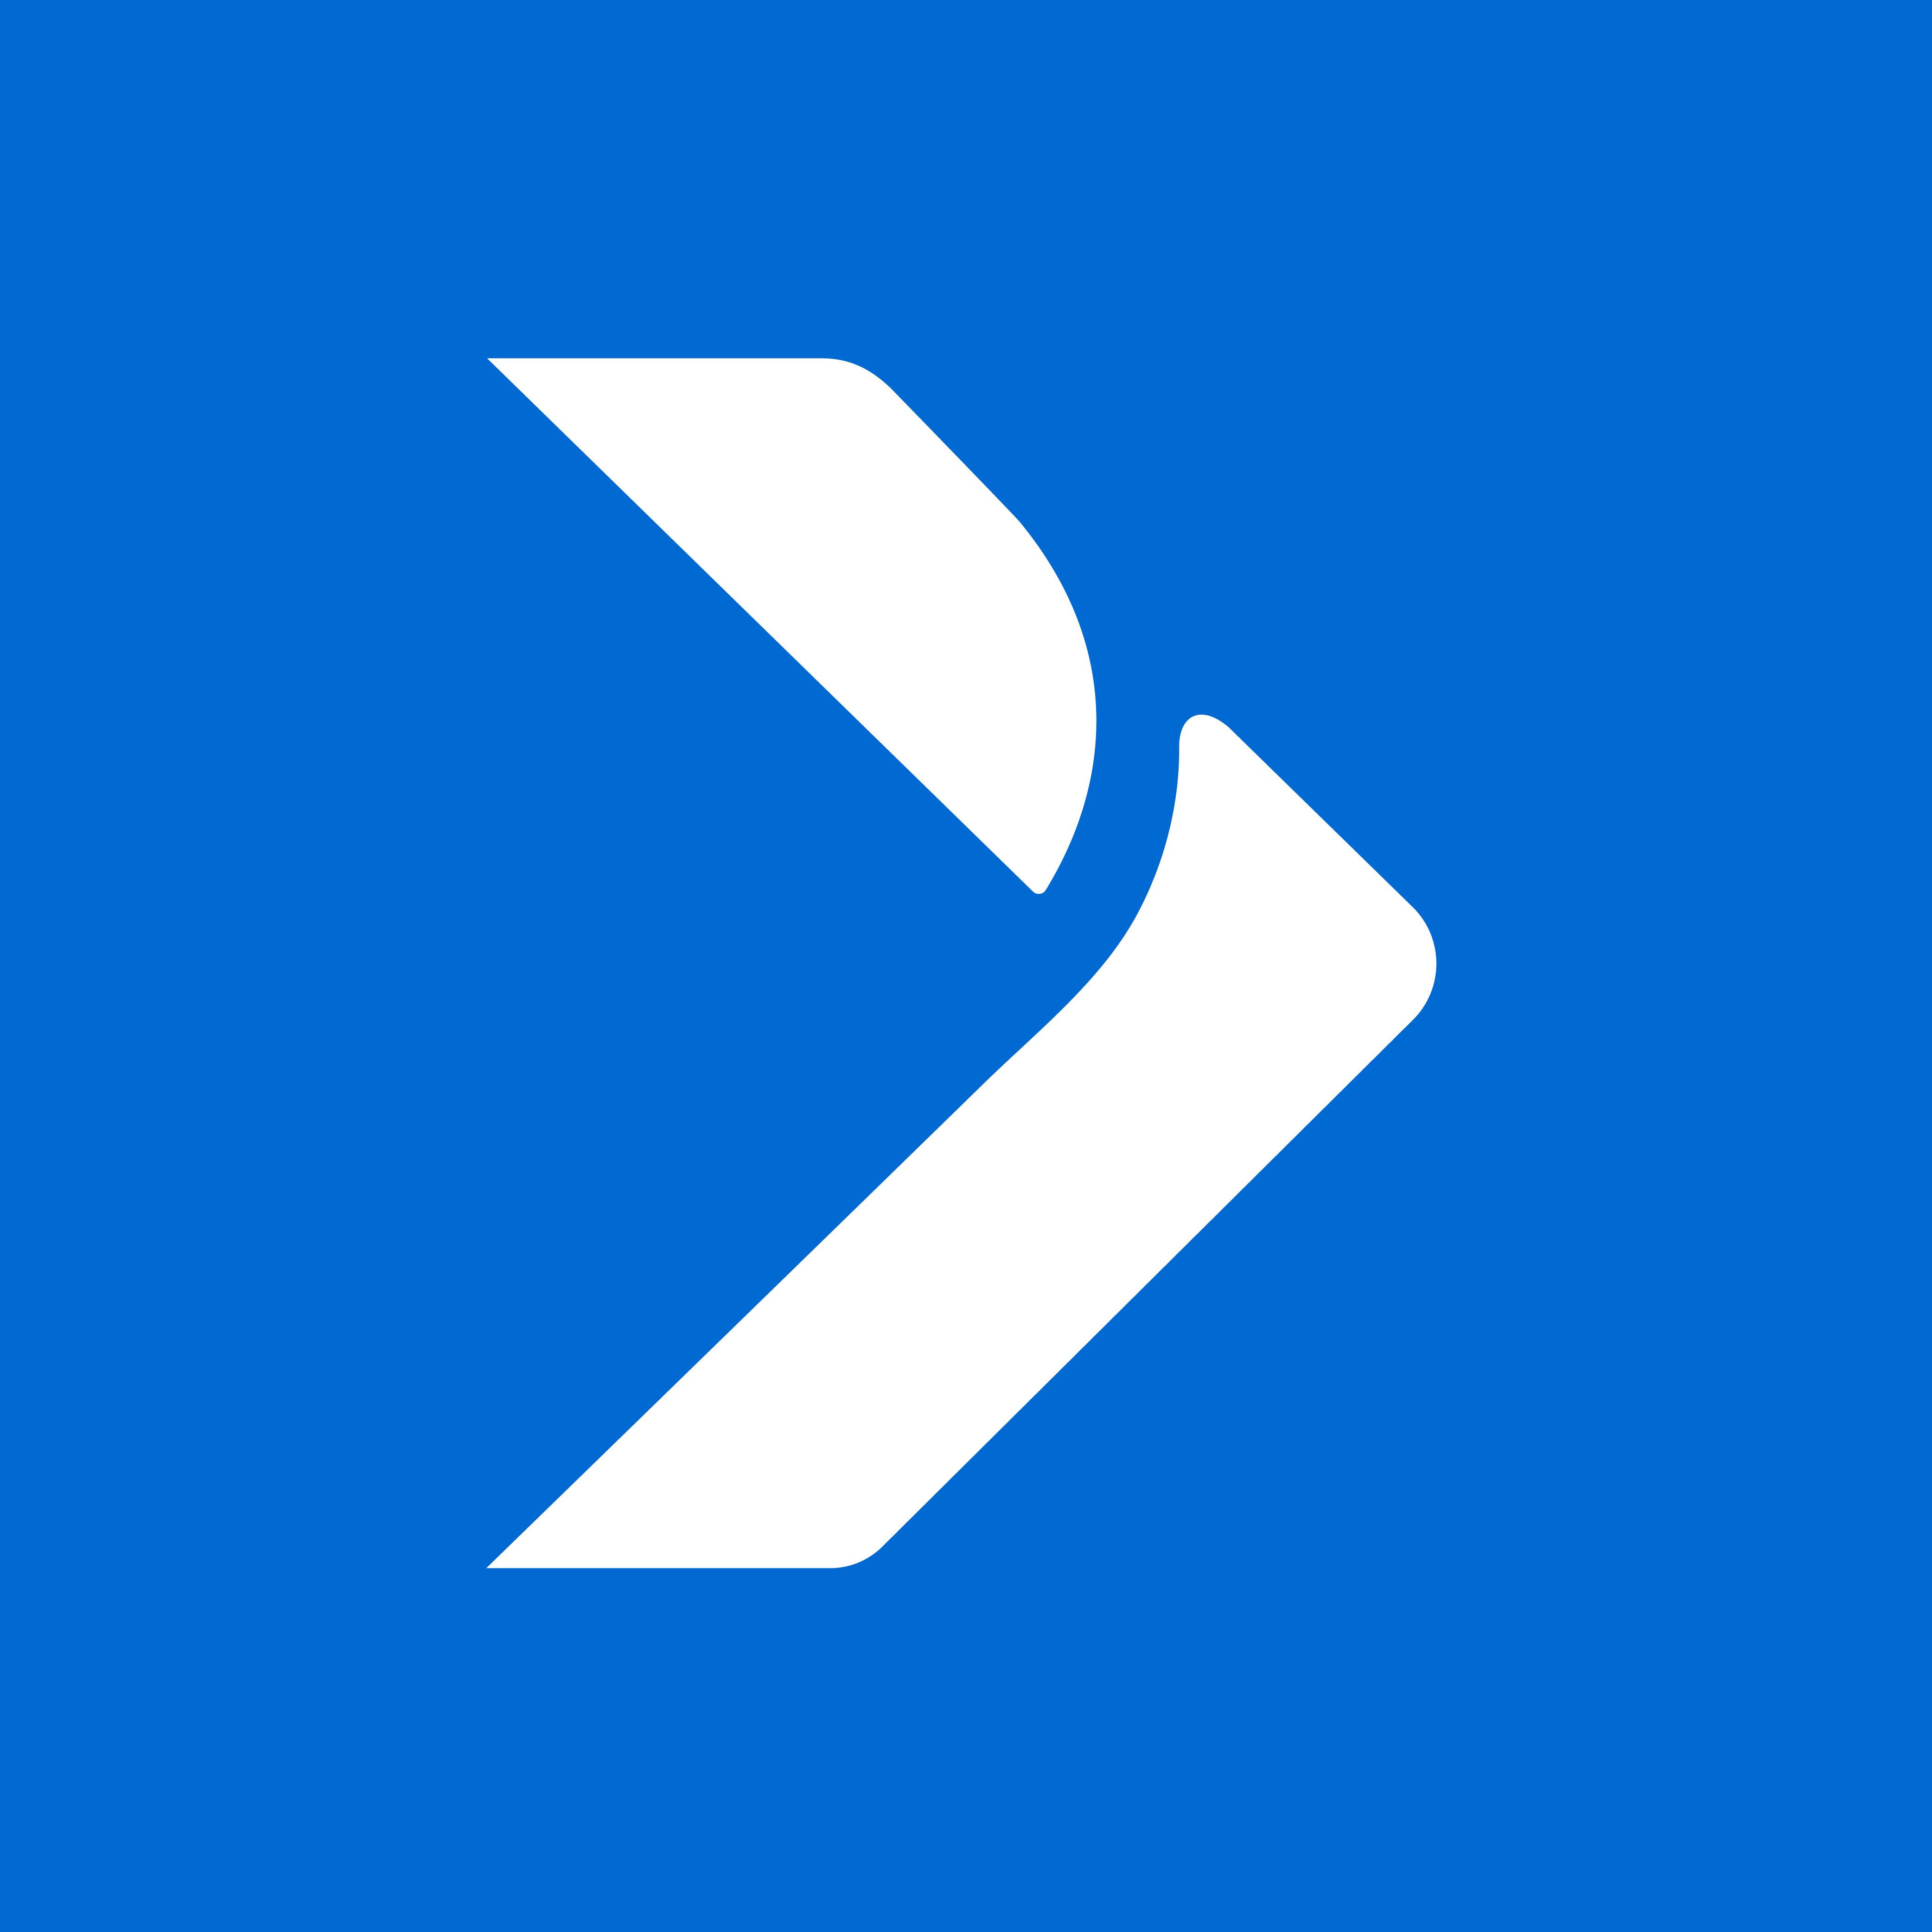 Senior Mobile Developer (Remote or On site)